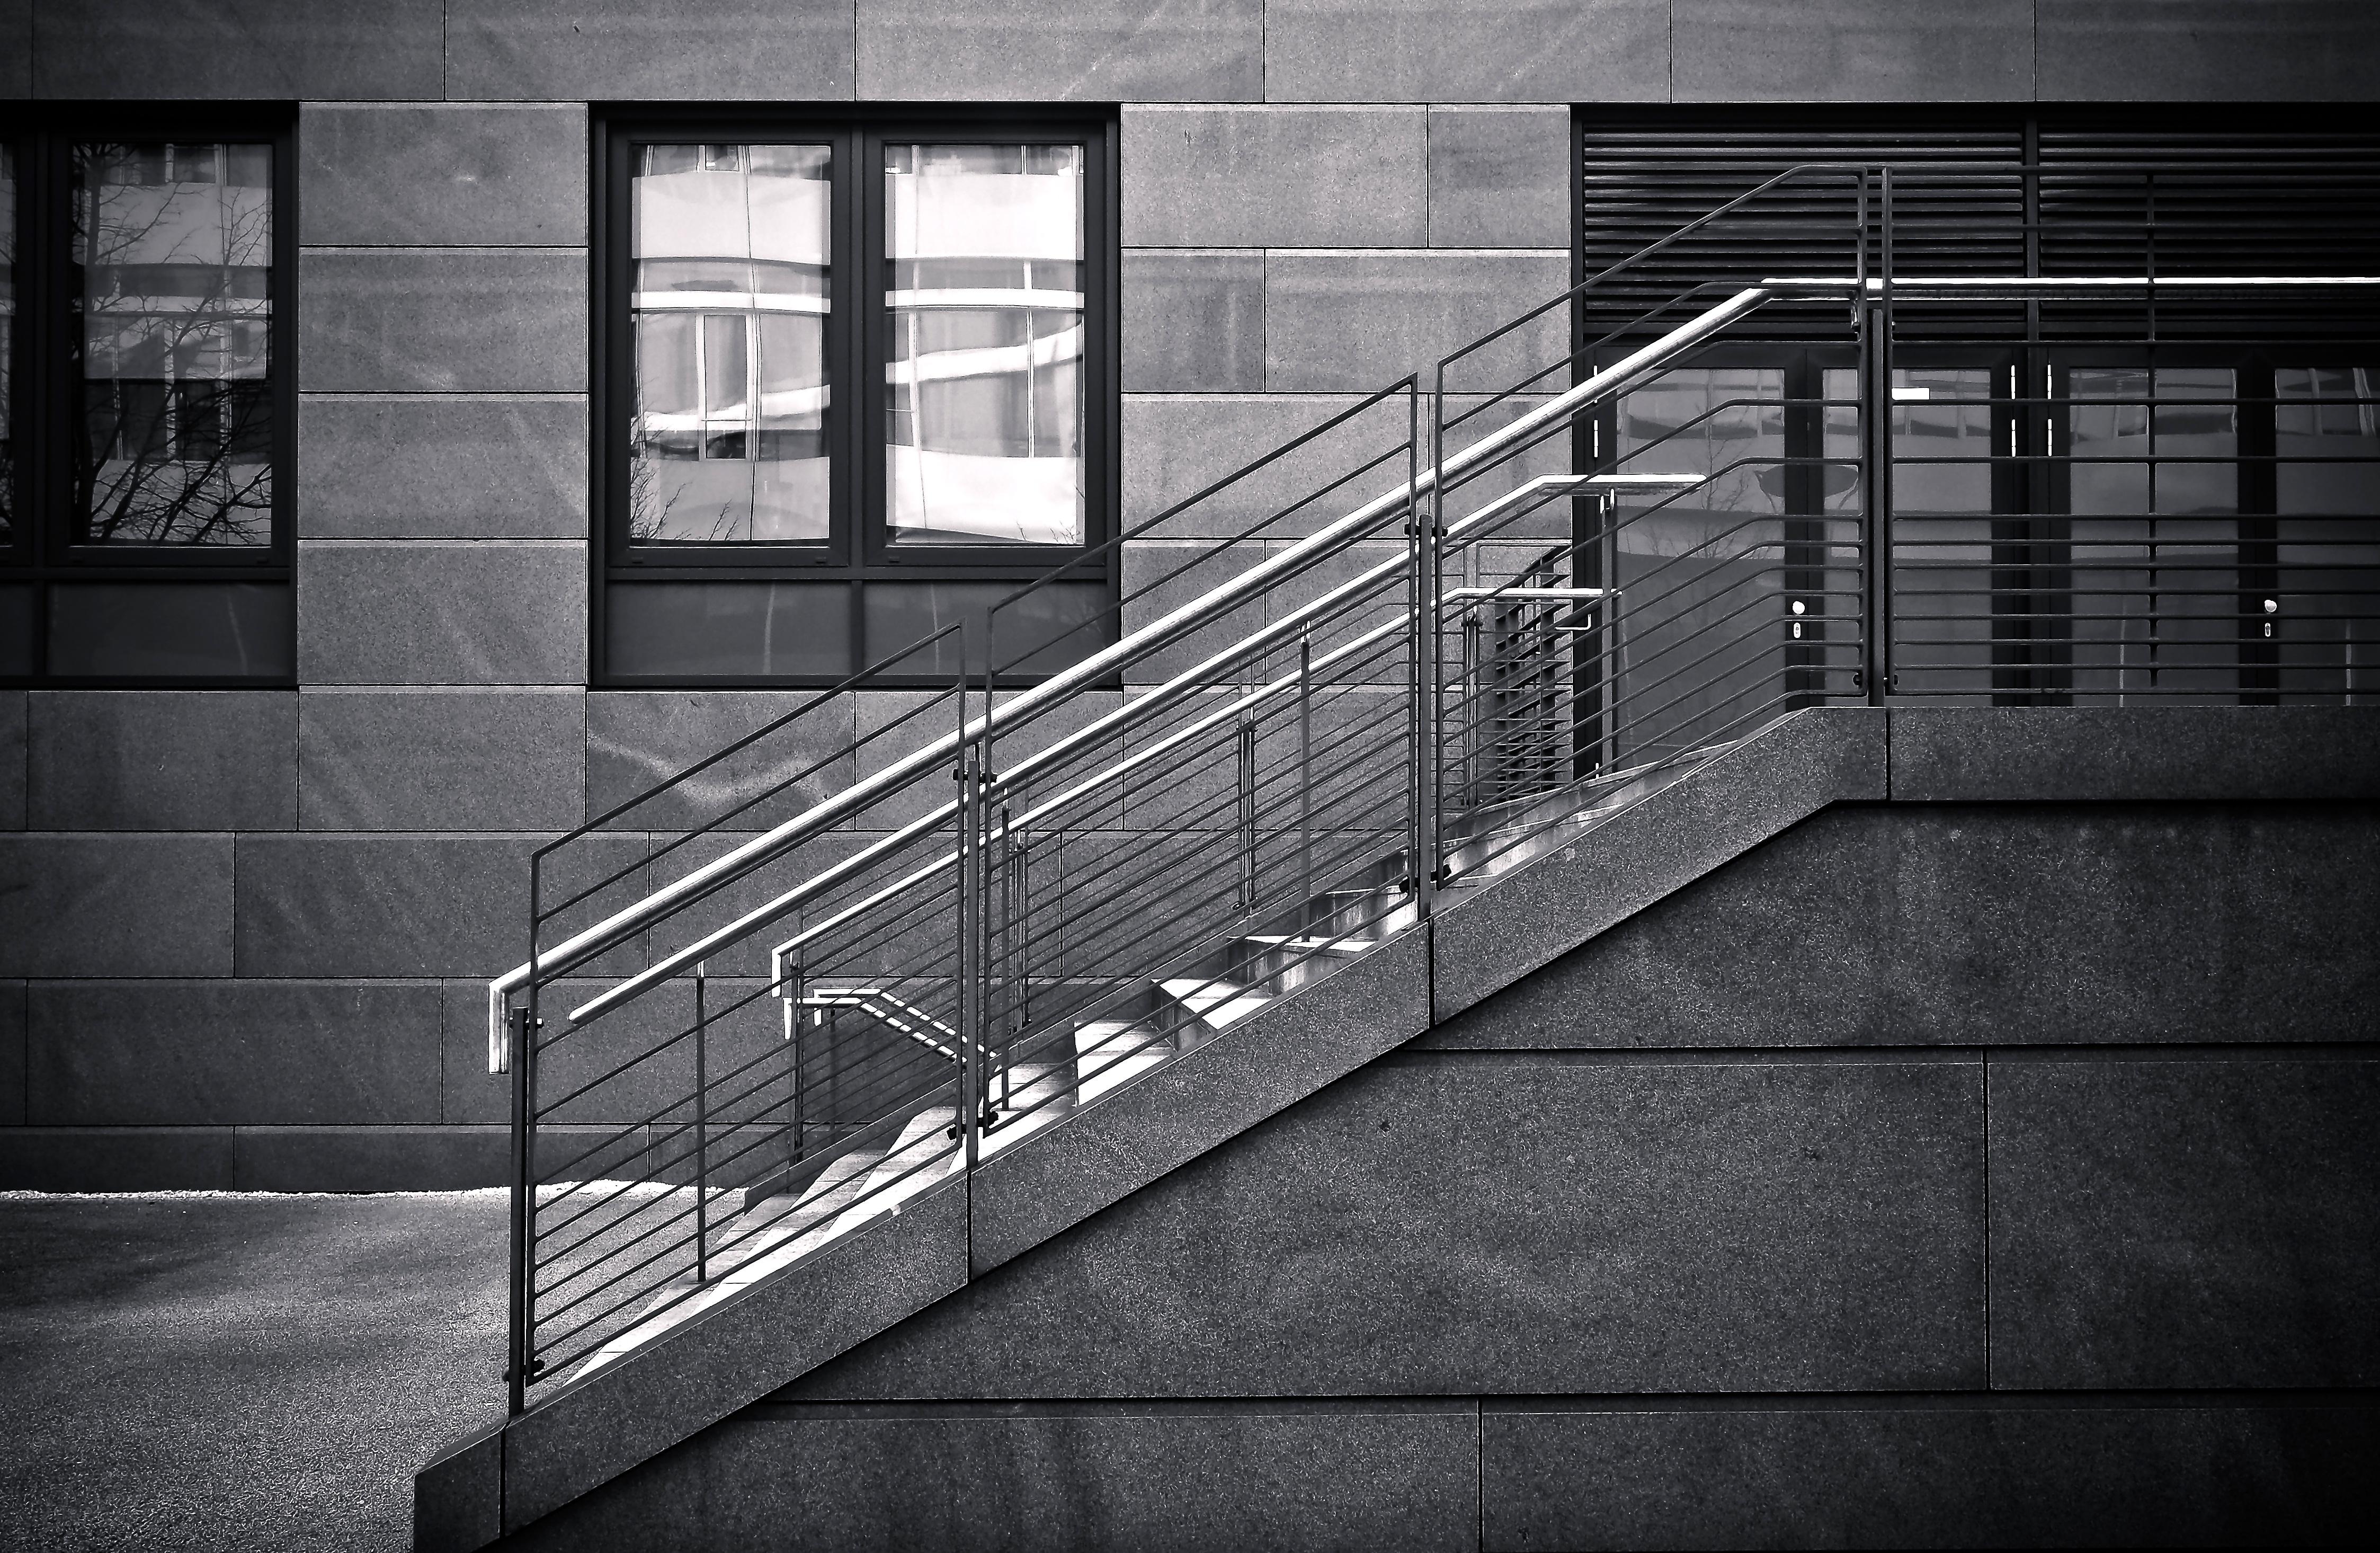 Construction Line Geometric Shadow Facade Darkness Modern Black White Concrete Interior Design Stairs Symmetry Gloomy Mood Shape Big City